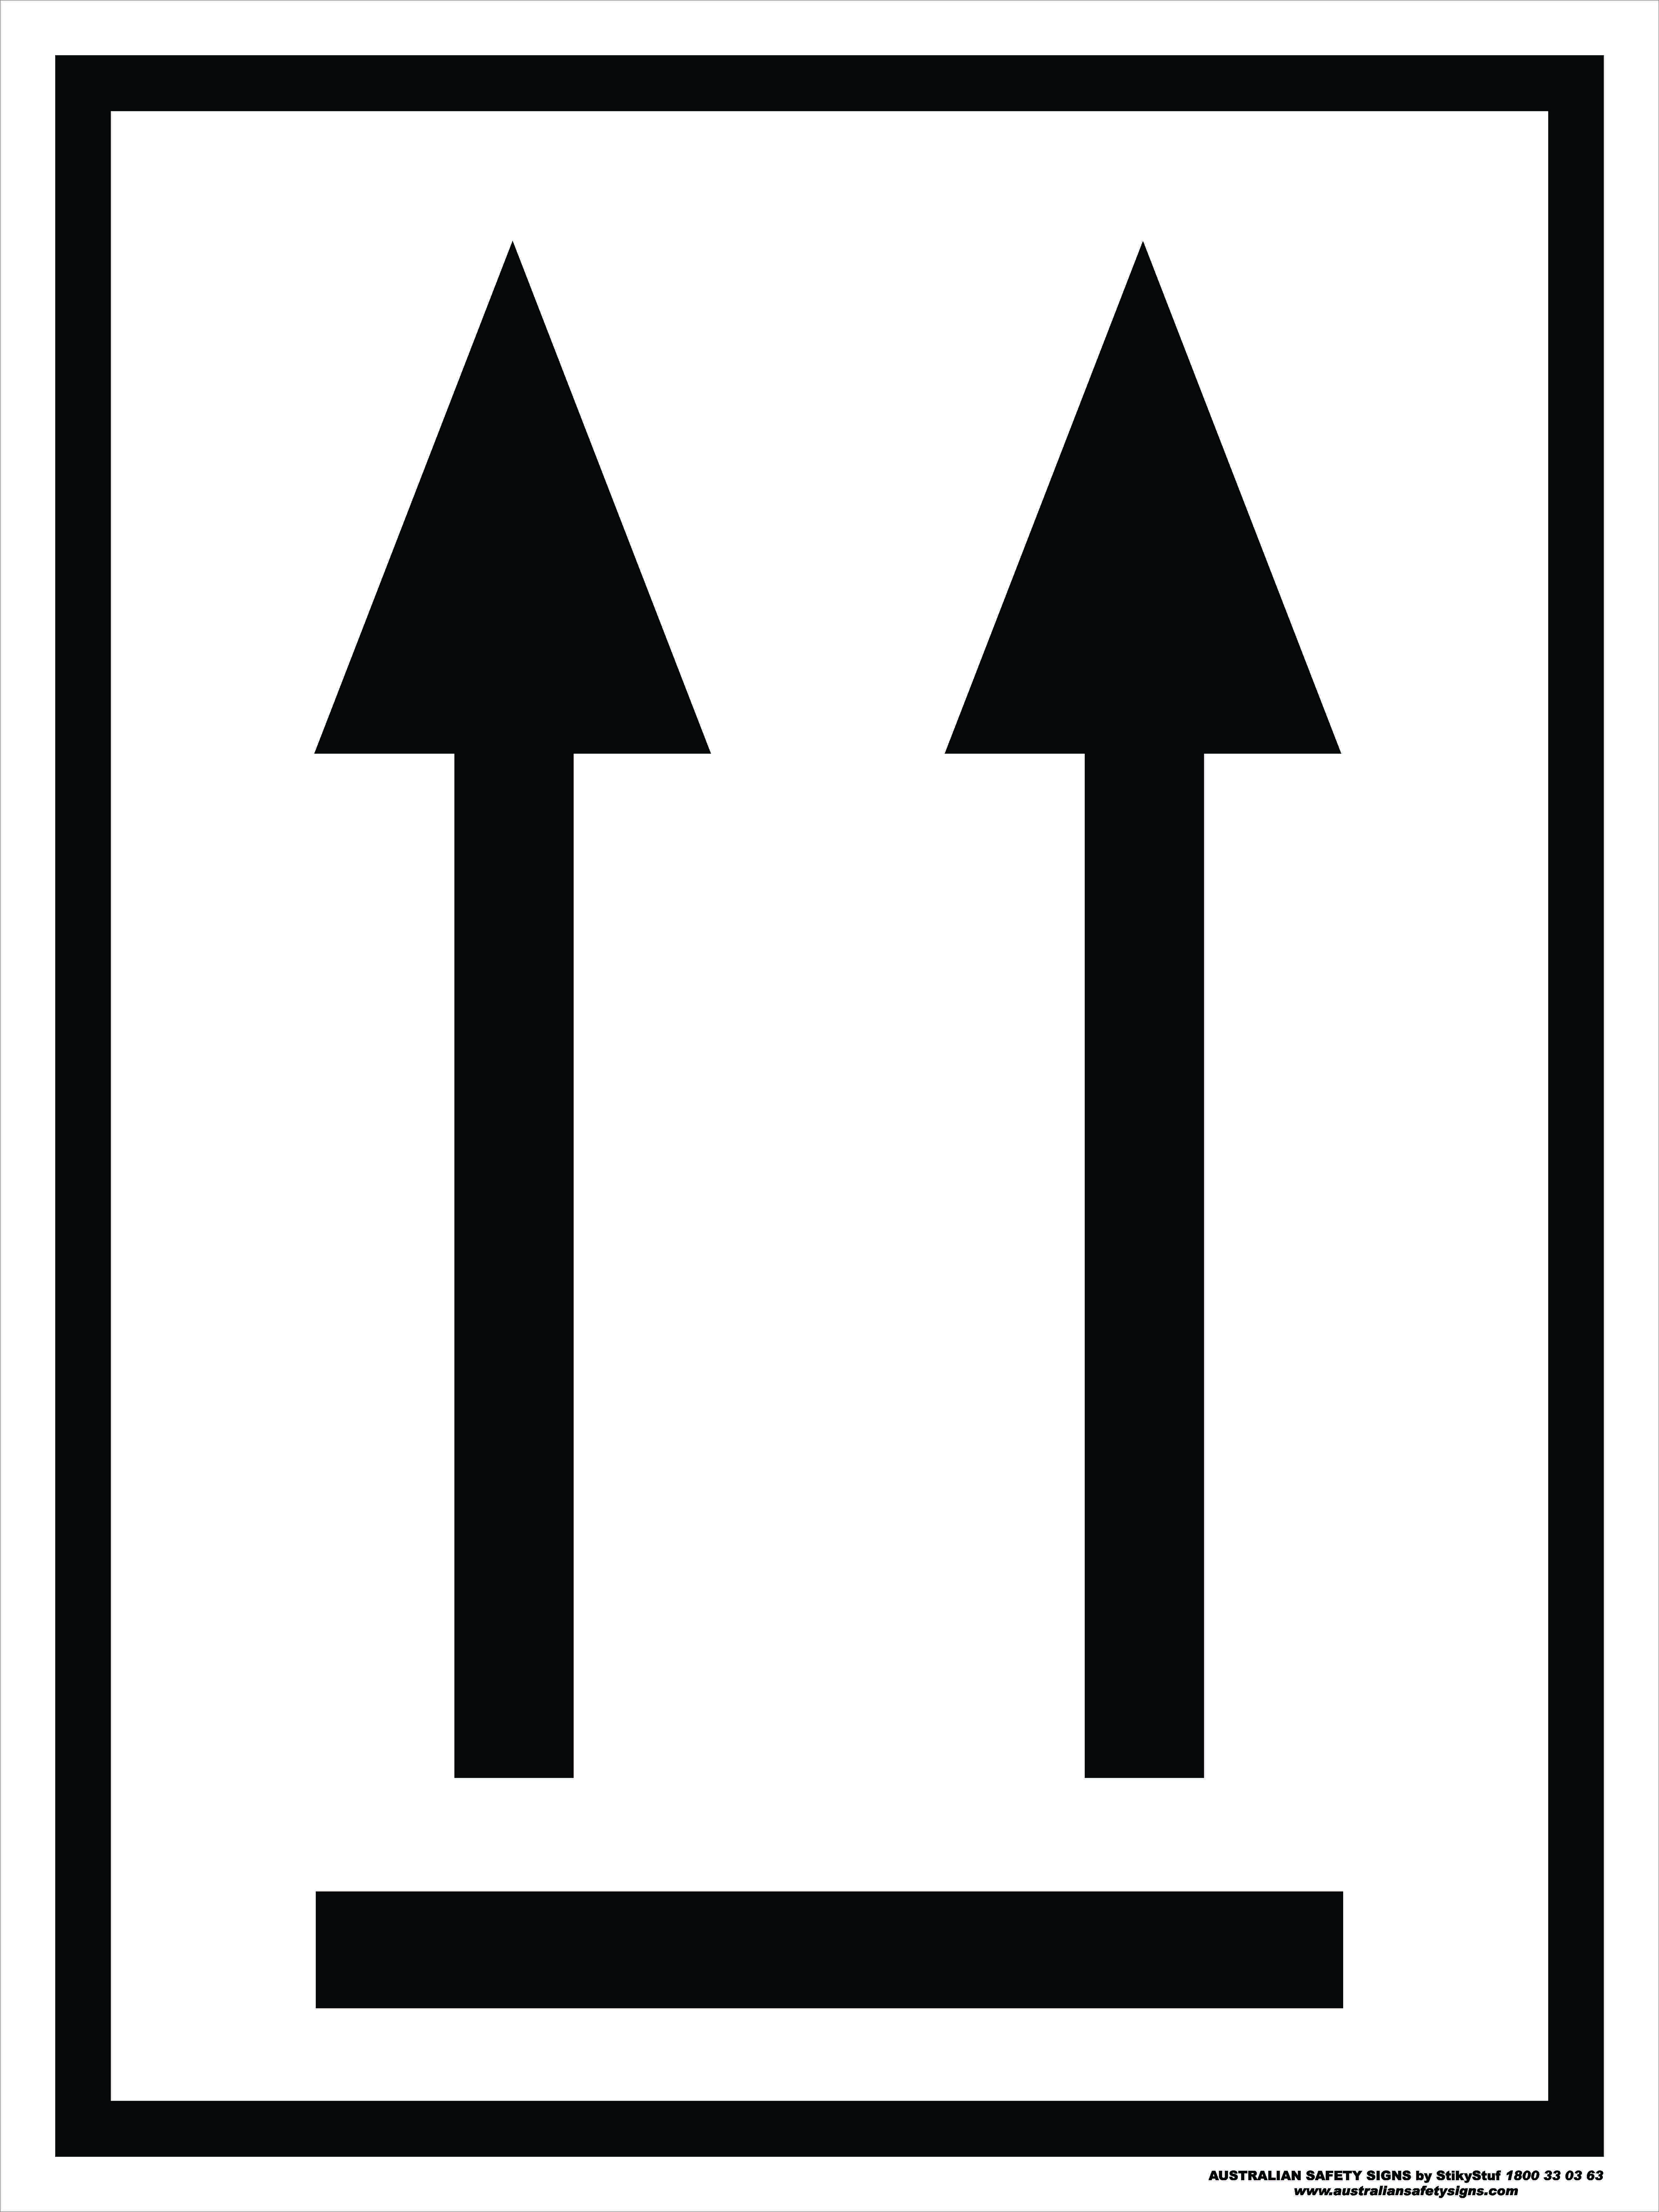 Orientation Arrows Black Discount Safety Signs Australia